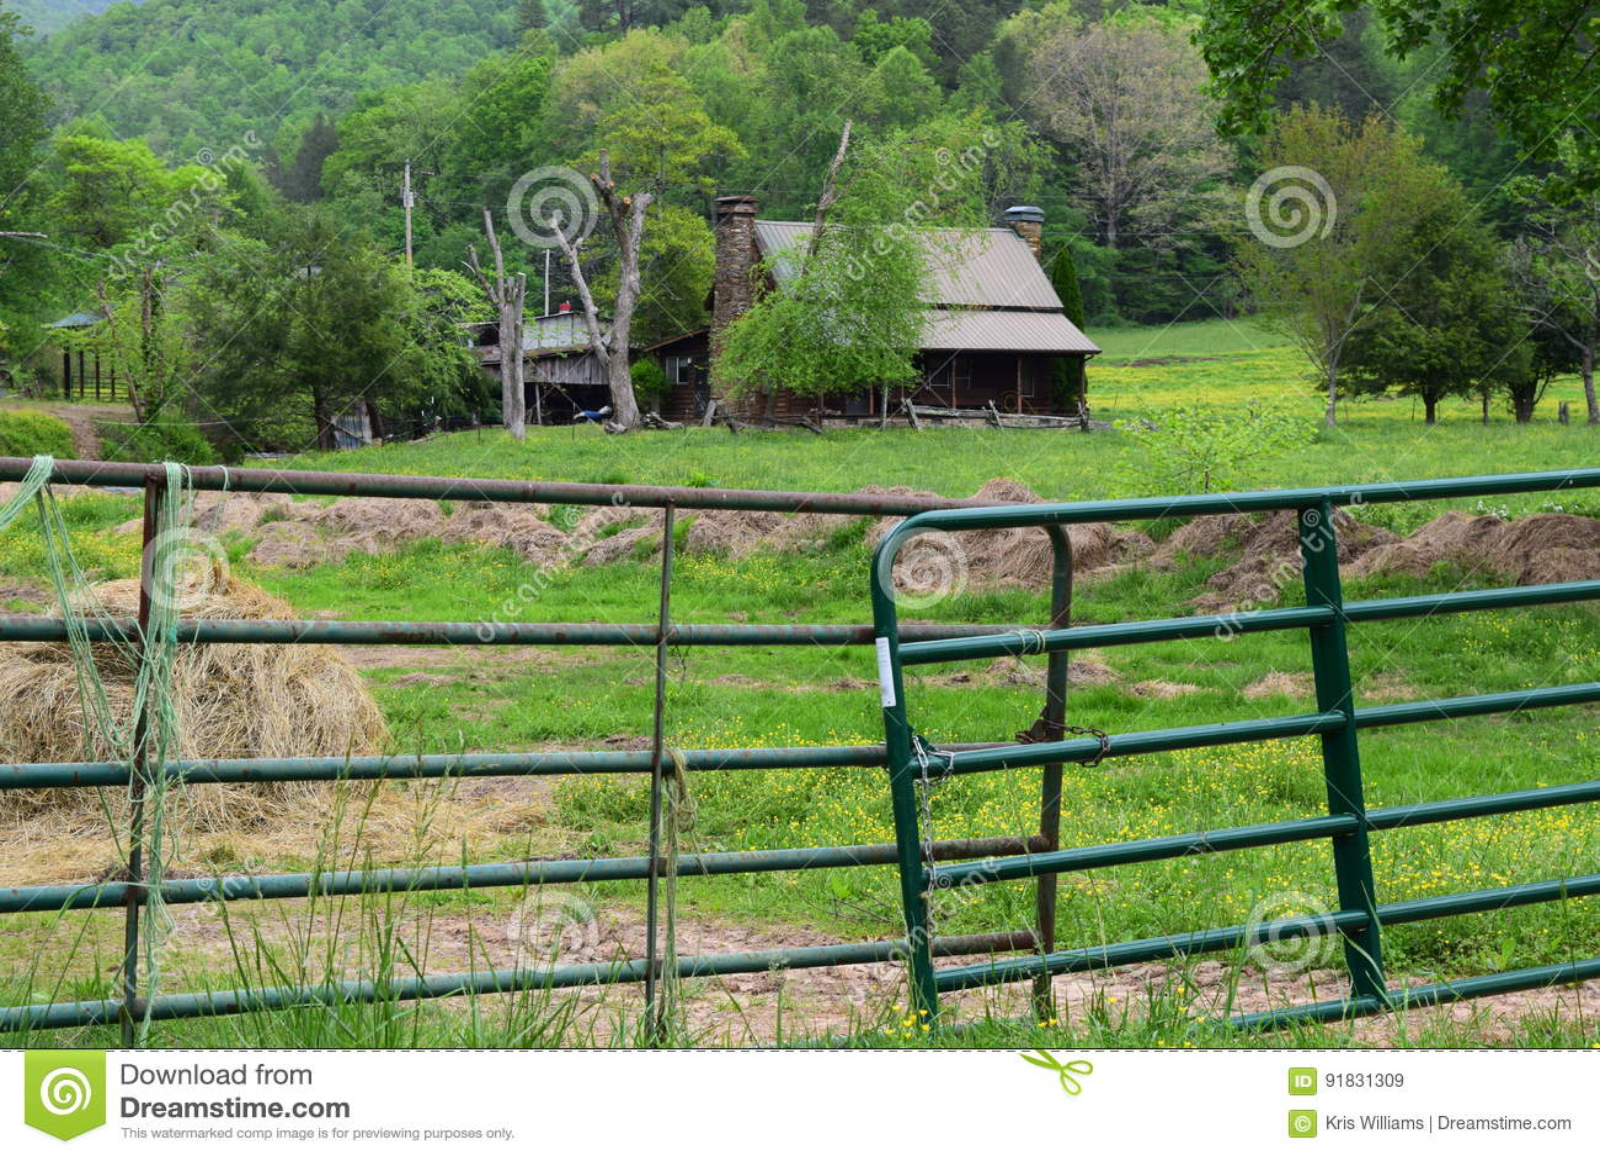 Western NC farmhouse